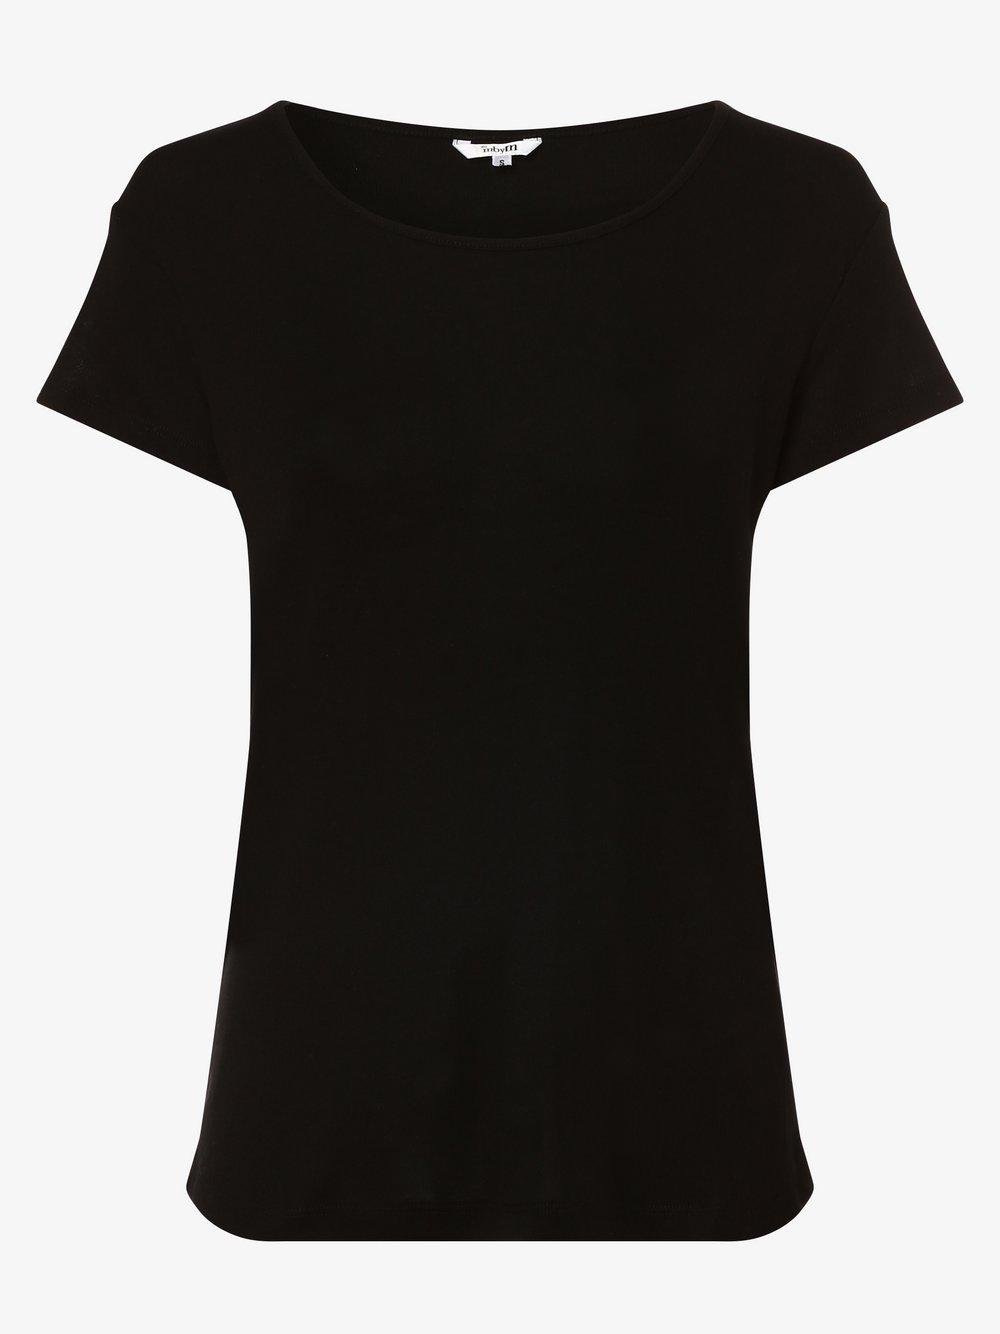 mbyM - T-shirt damski – Lucianna, czarny